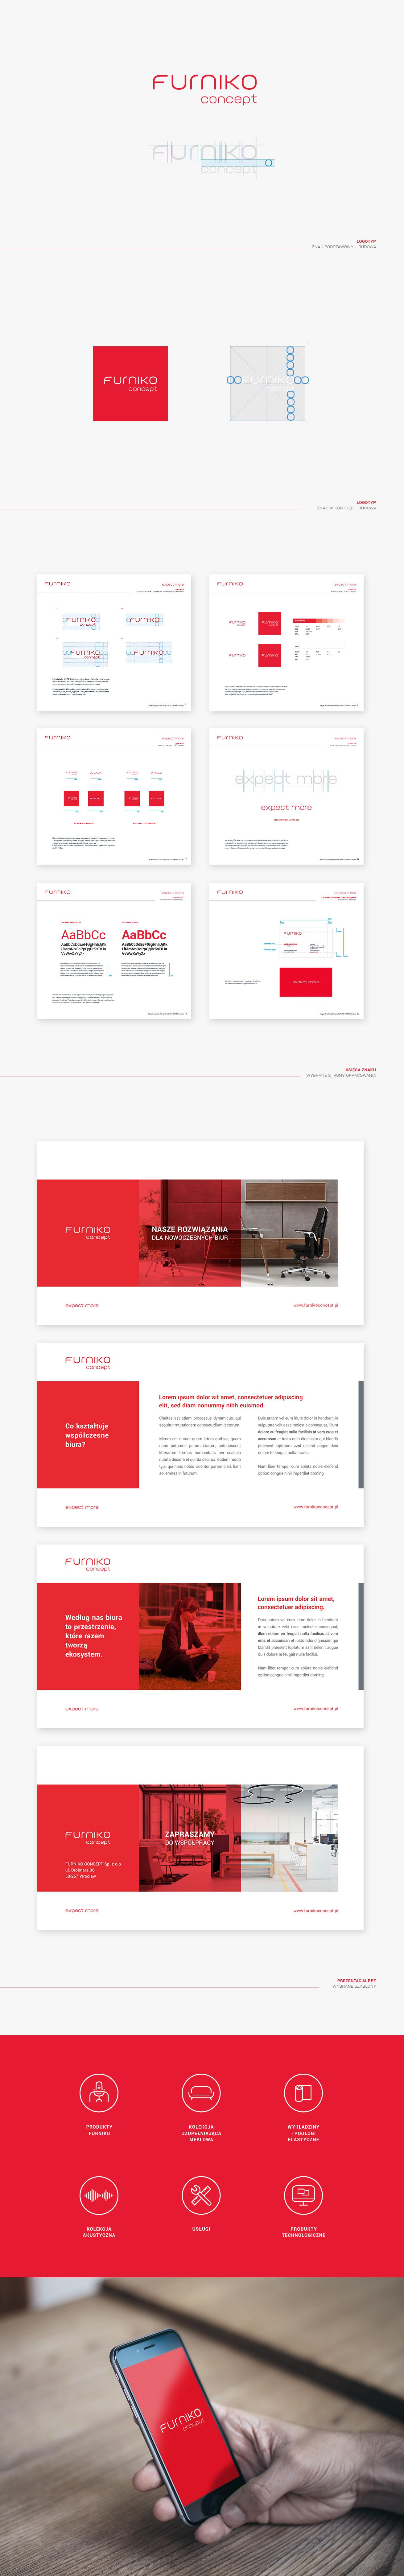 System identification for Furniko Concept (Poland)